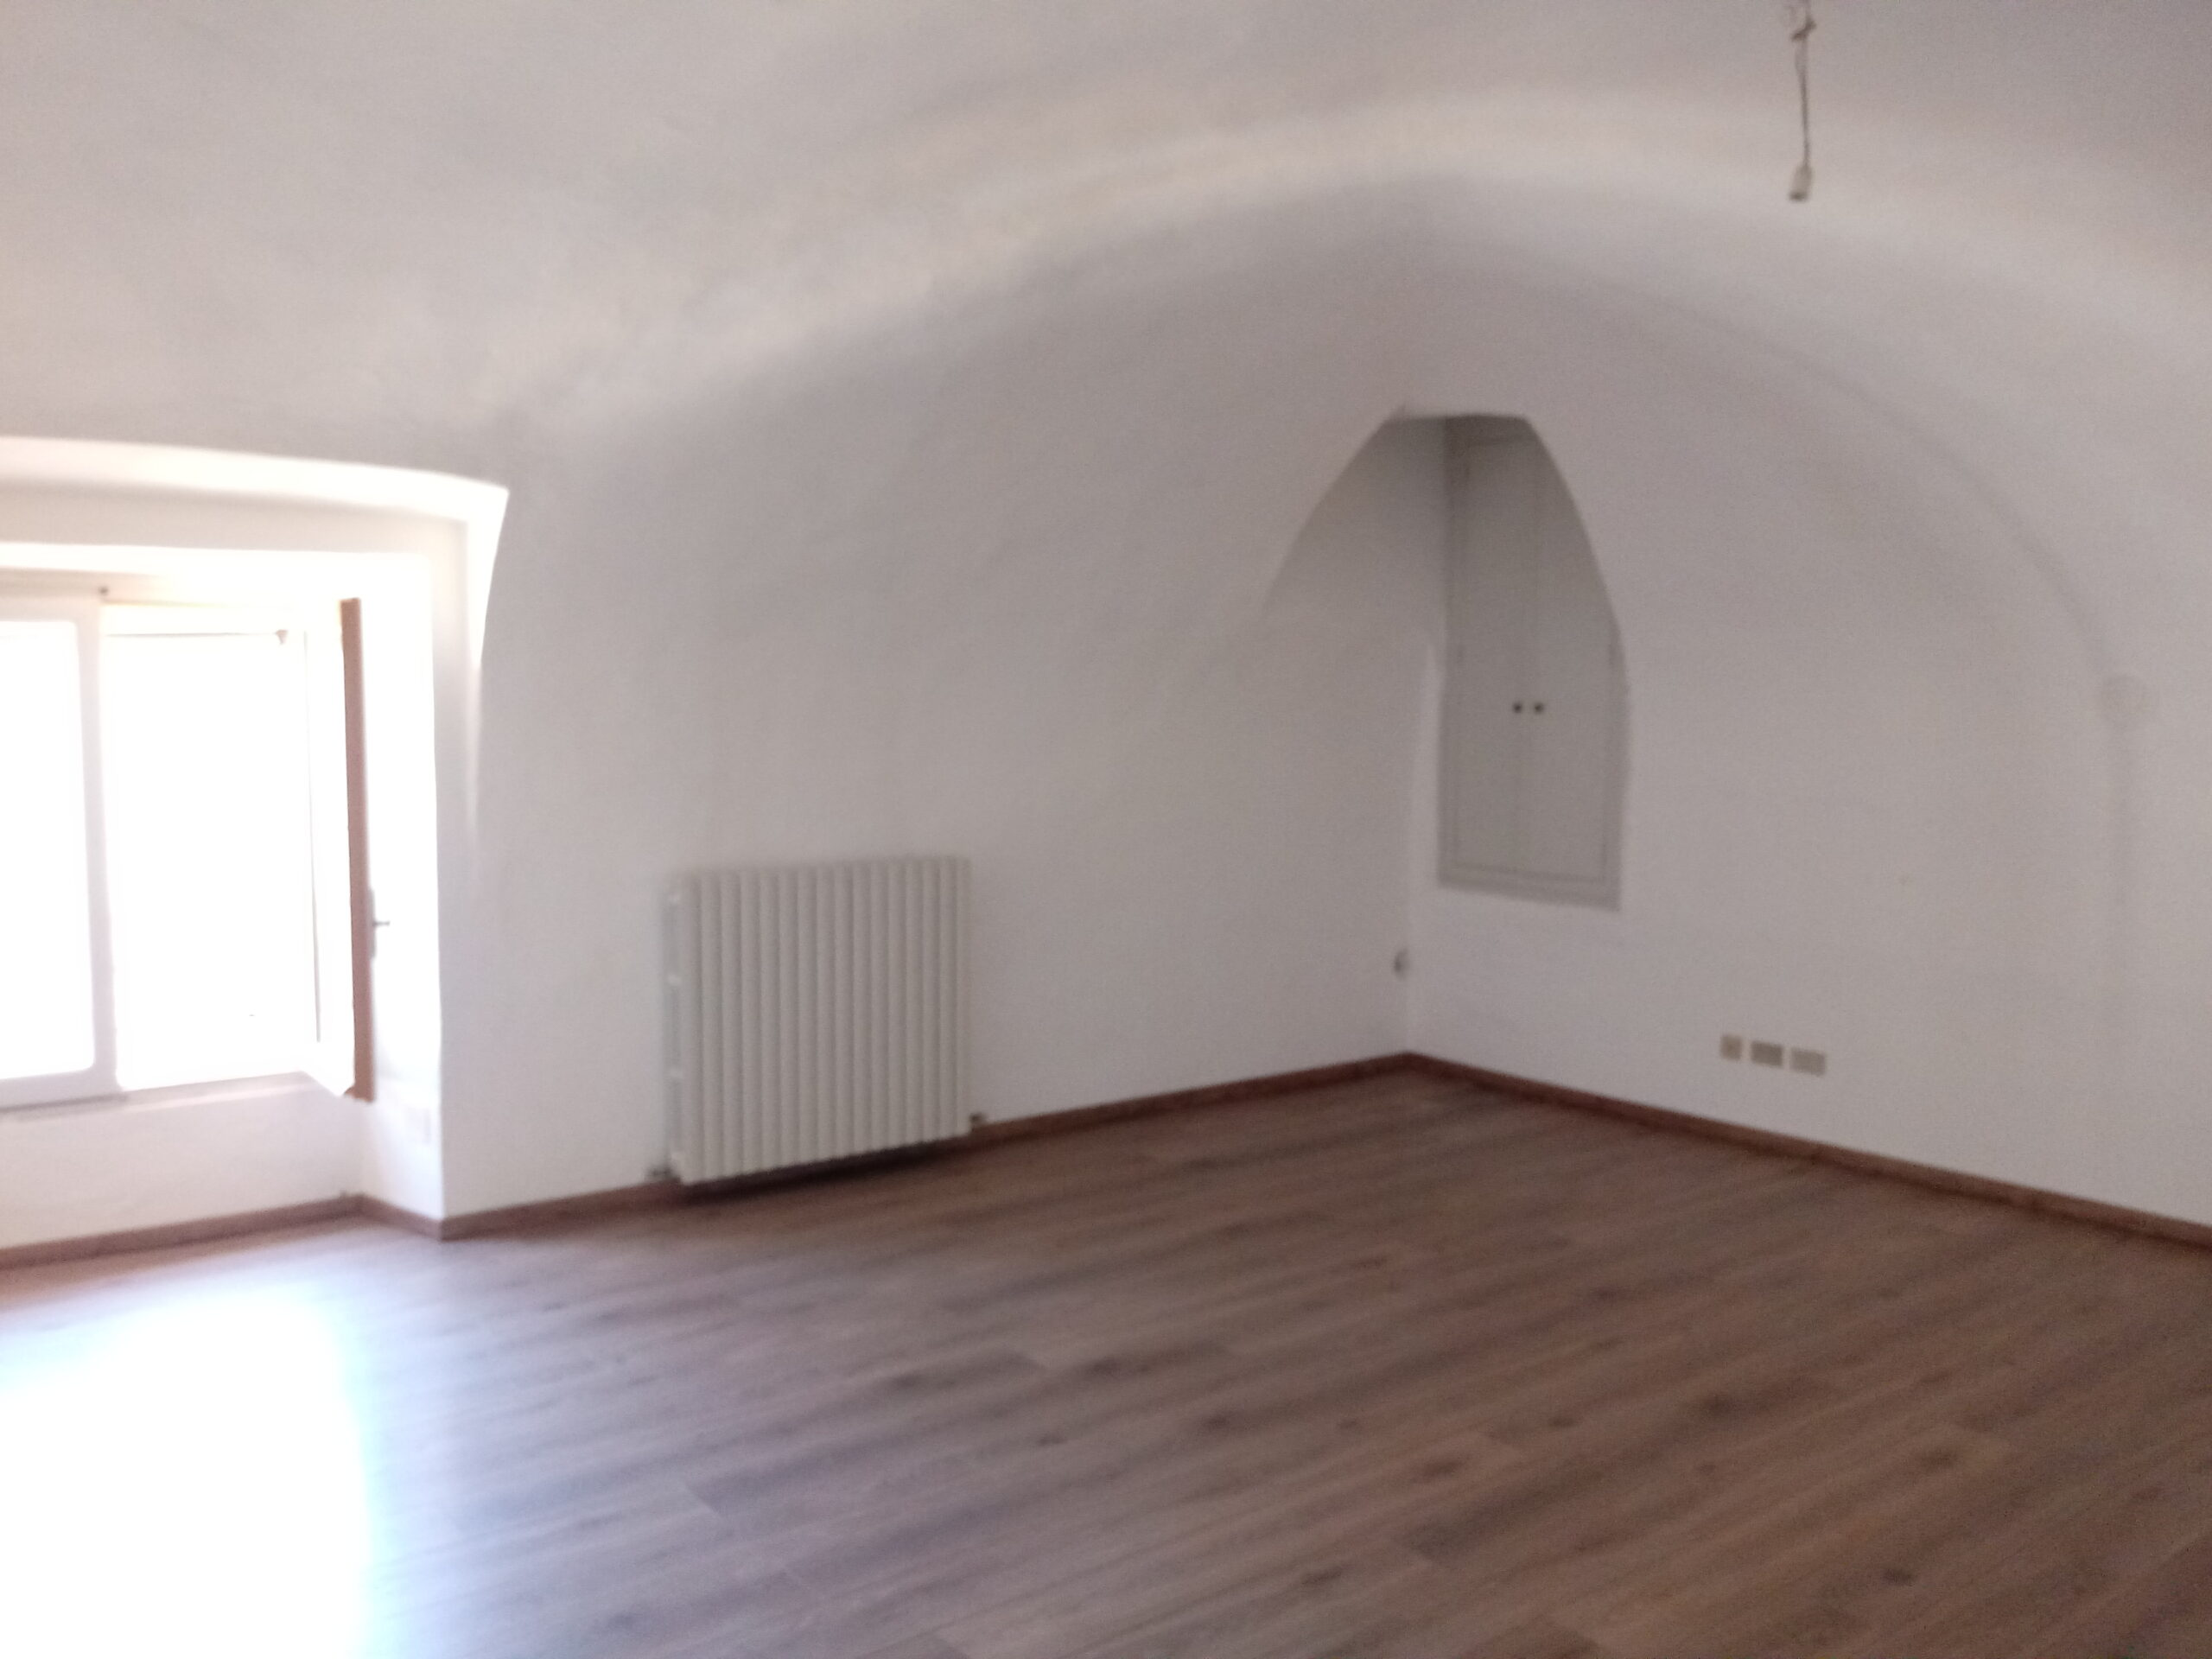 Cuneo, centro storico – Quadrilocale in vendita.